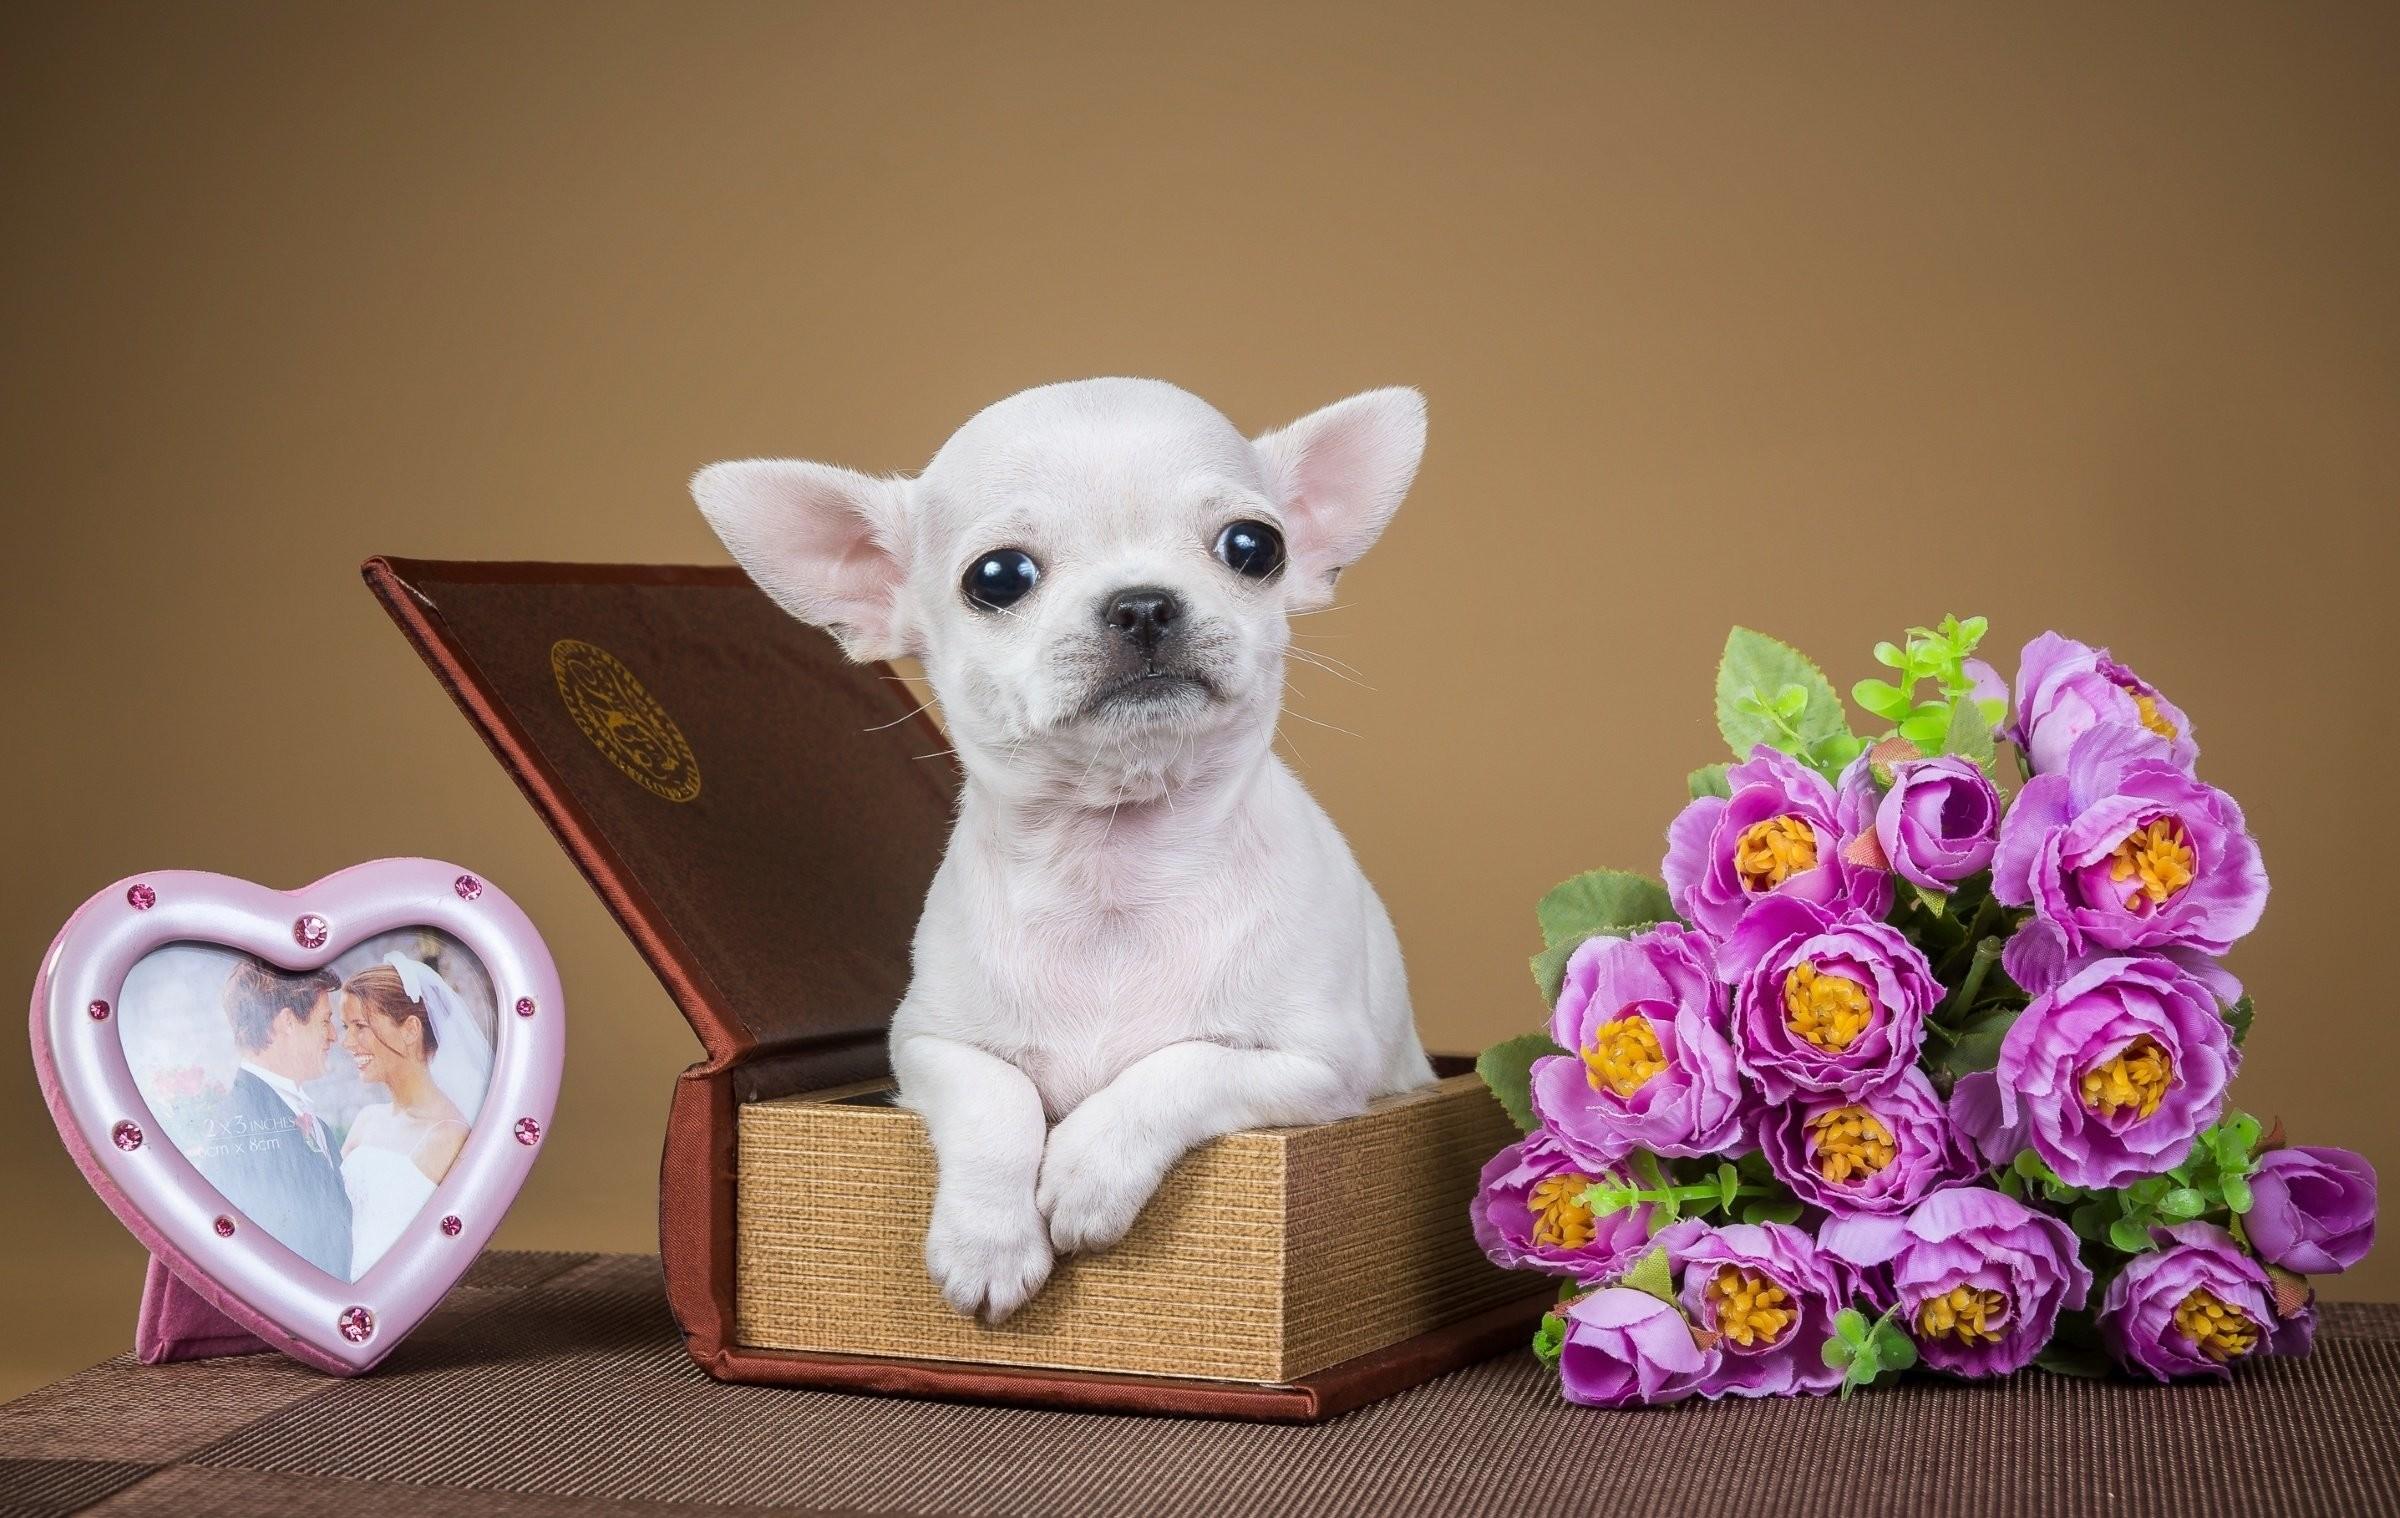 Chihuahua puppy dog flowers jewelry box wallpaper | | 719415 |  WallpaperUP